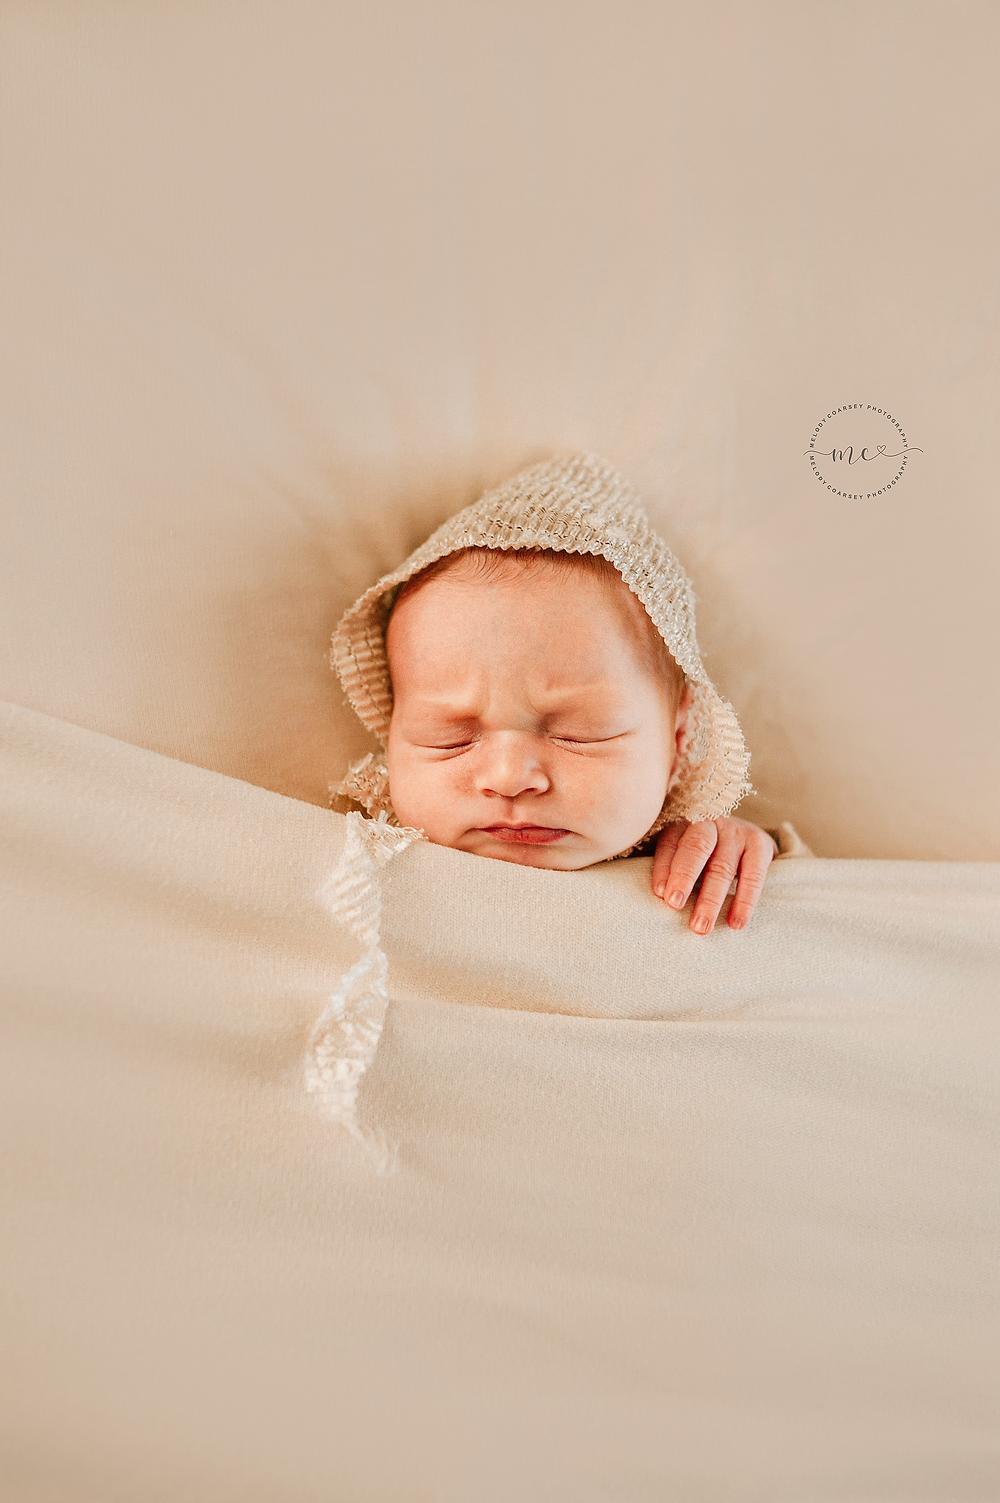 newborn portrait photographer near me